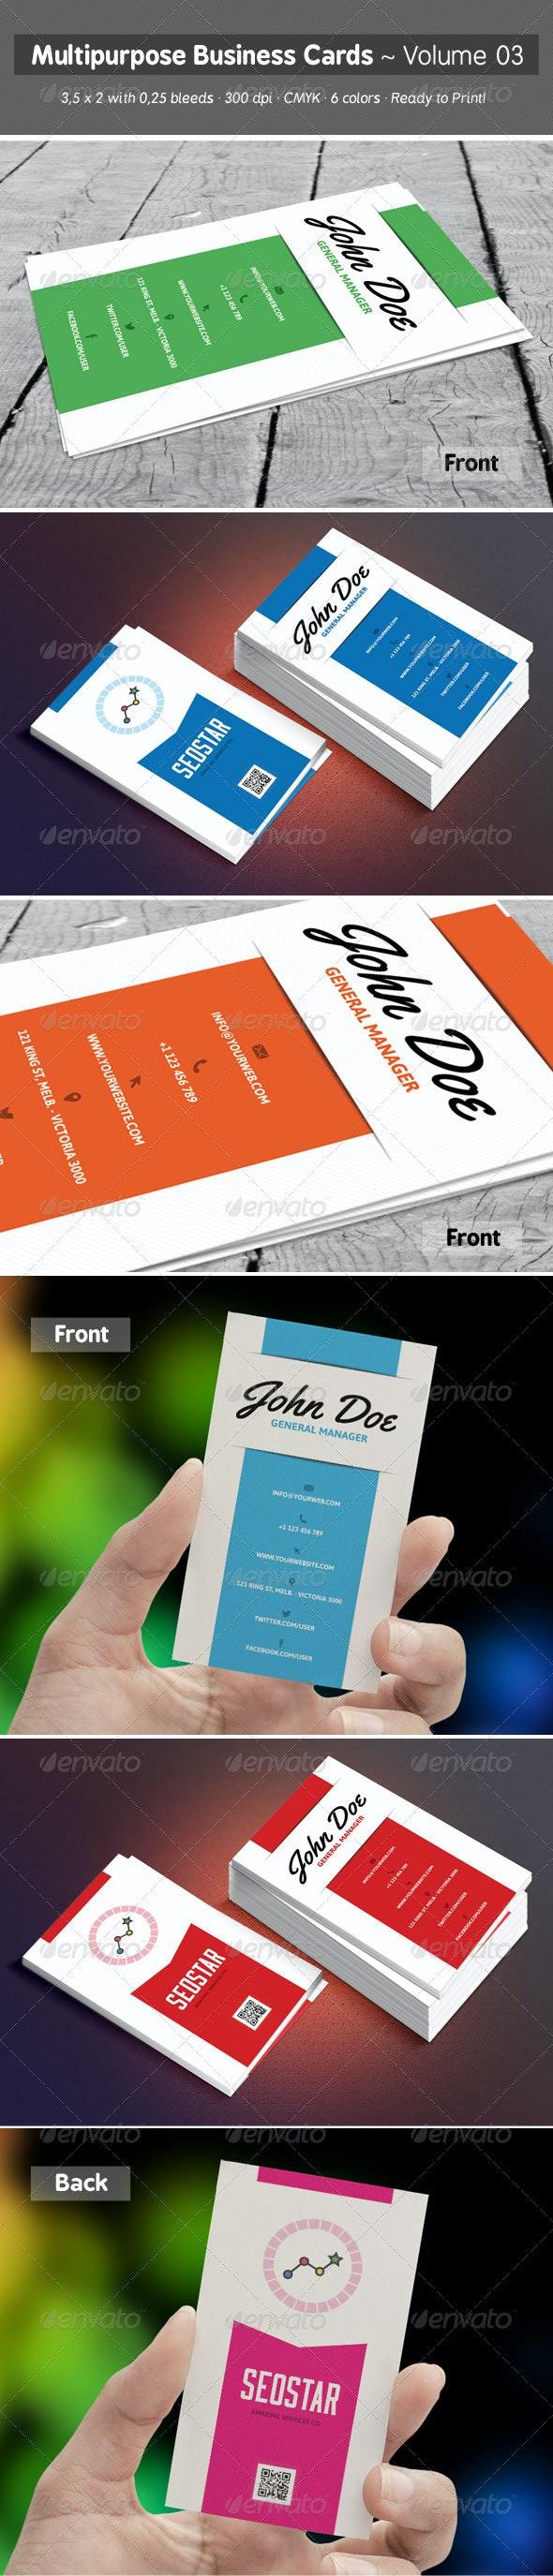 Multipurpose Business Cards - Volume 03 - Creative Business Cards